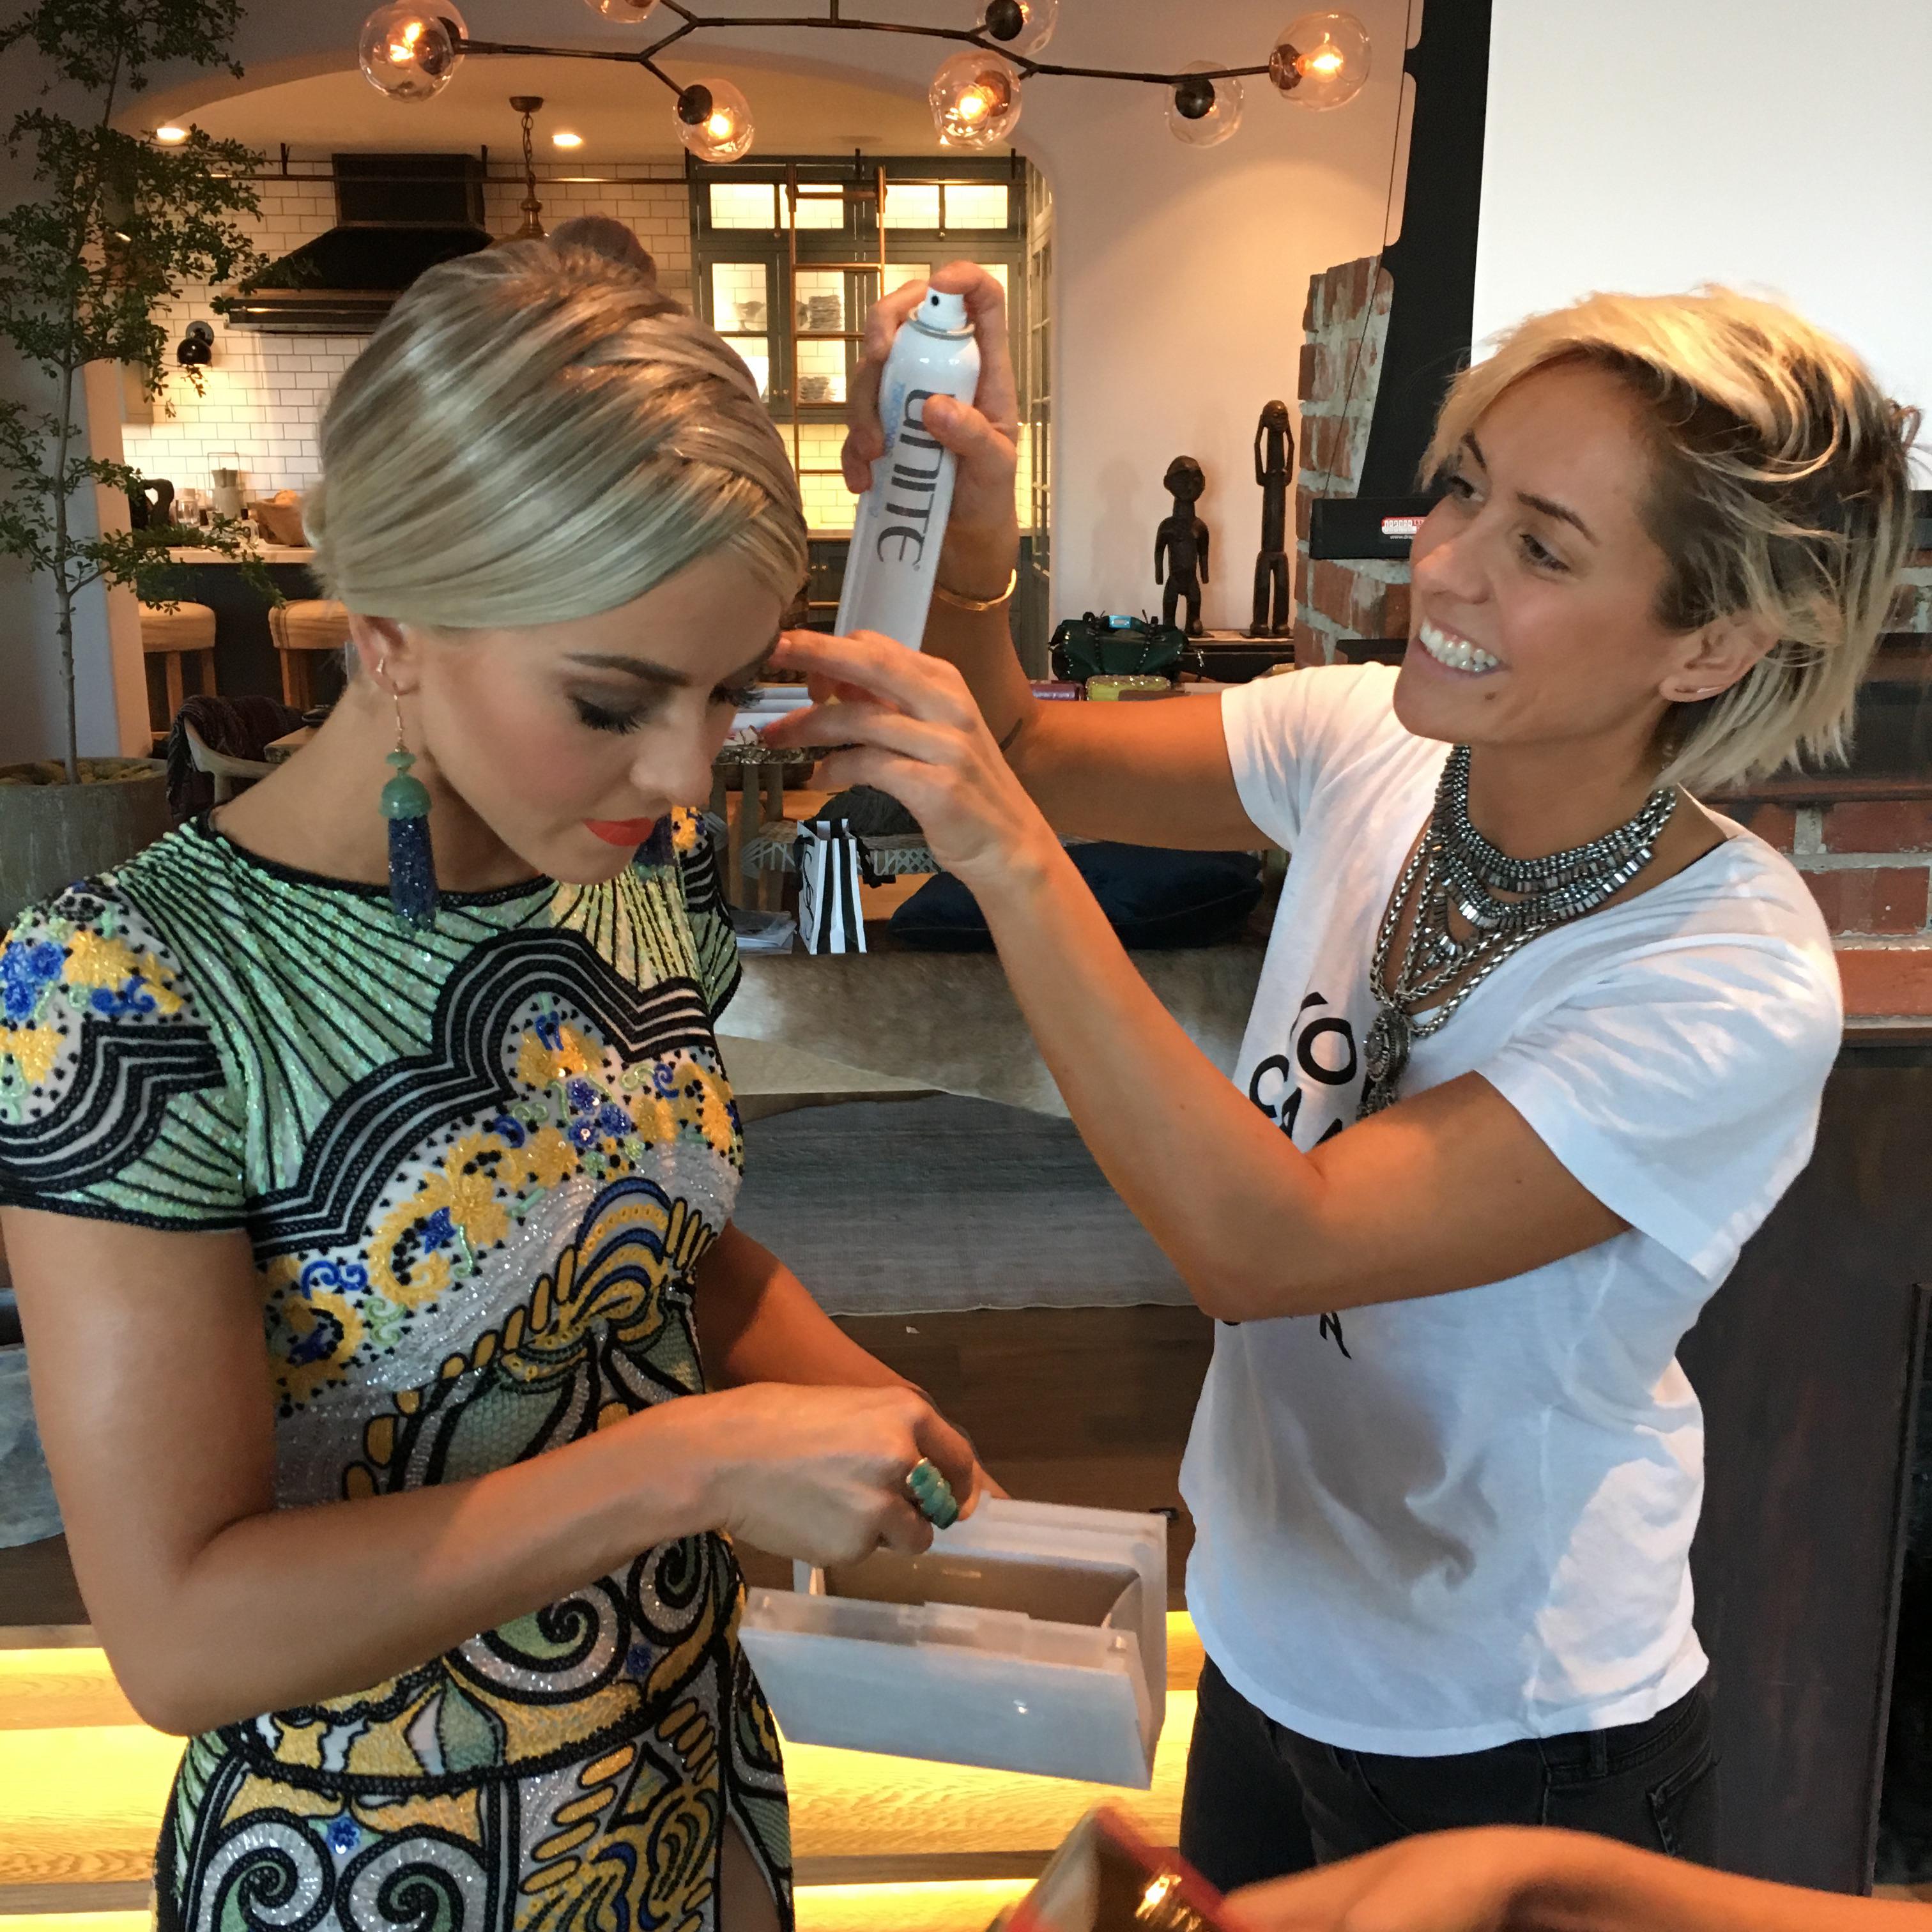 Julianne Hough for the American Music Awards 2015: Hair by Riawna Capri Using Unite